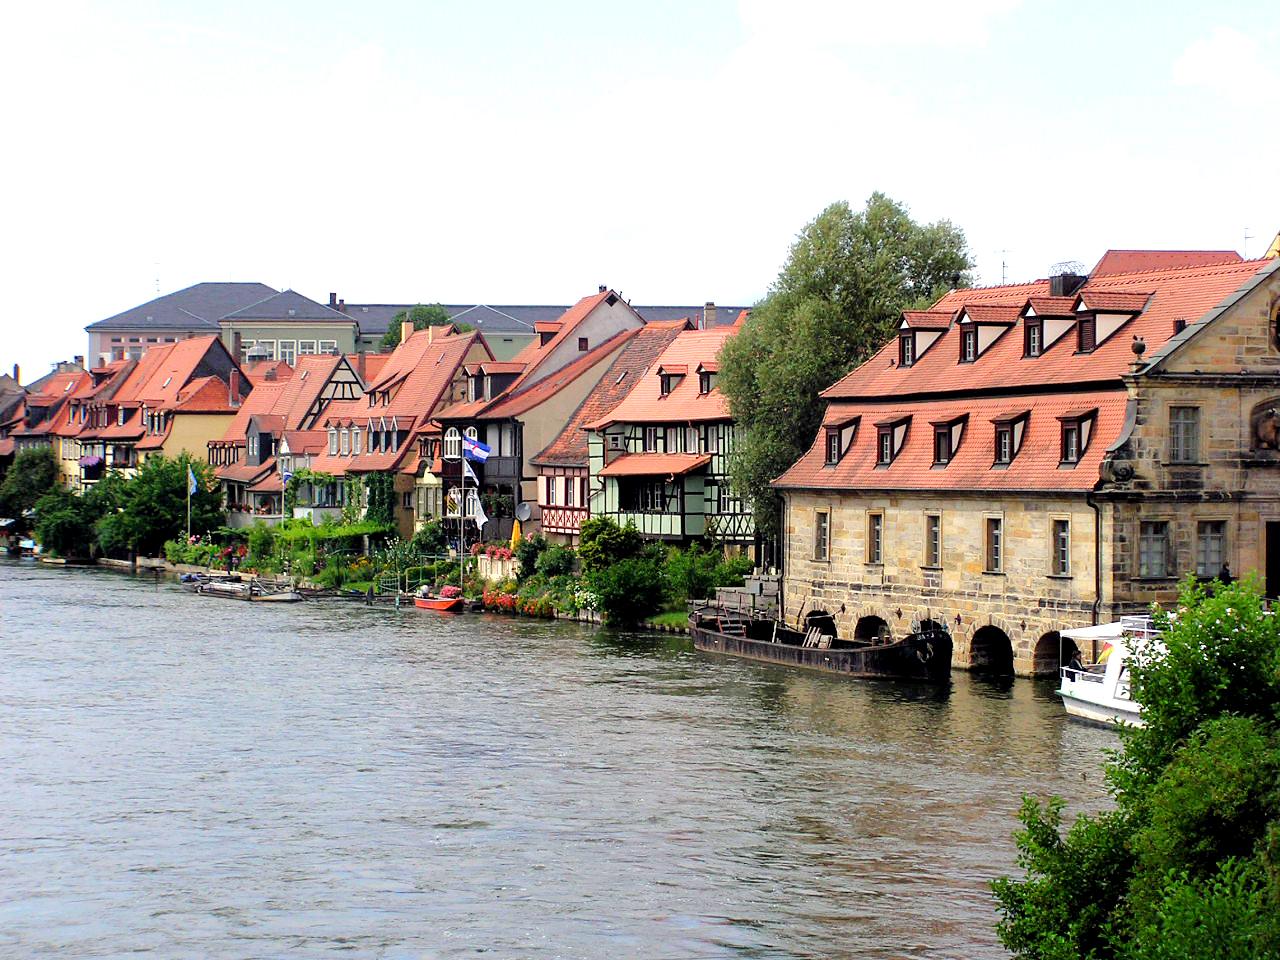 File:Bamberg Klein-Venedig II.jpg - Wikimedia Commons